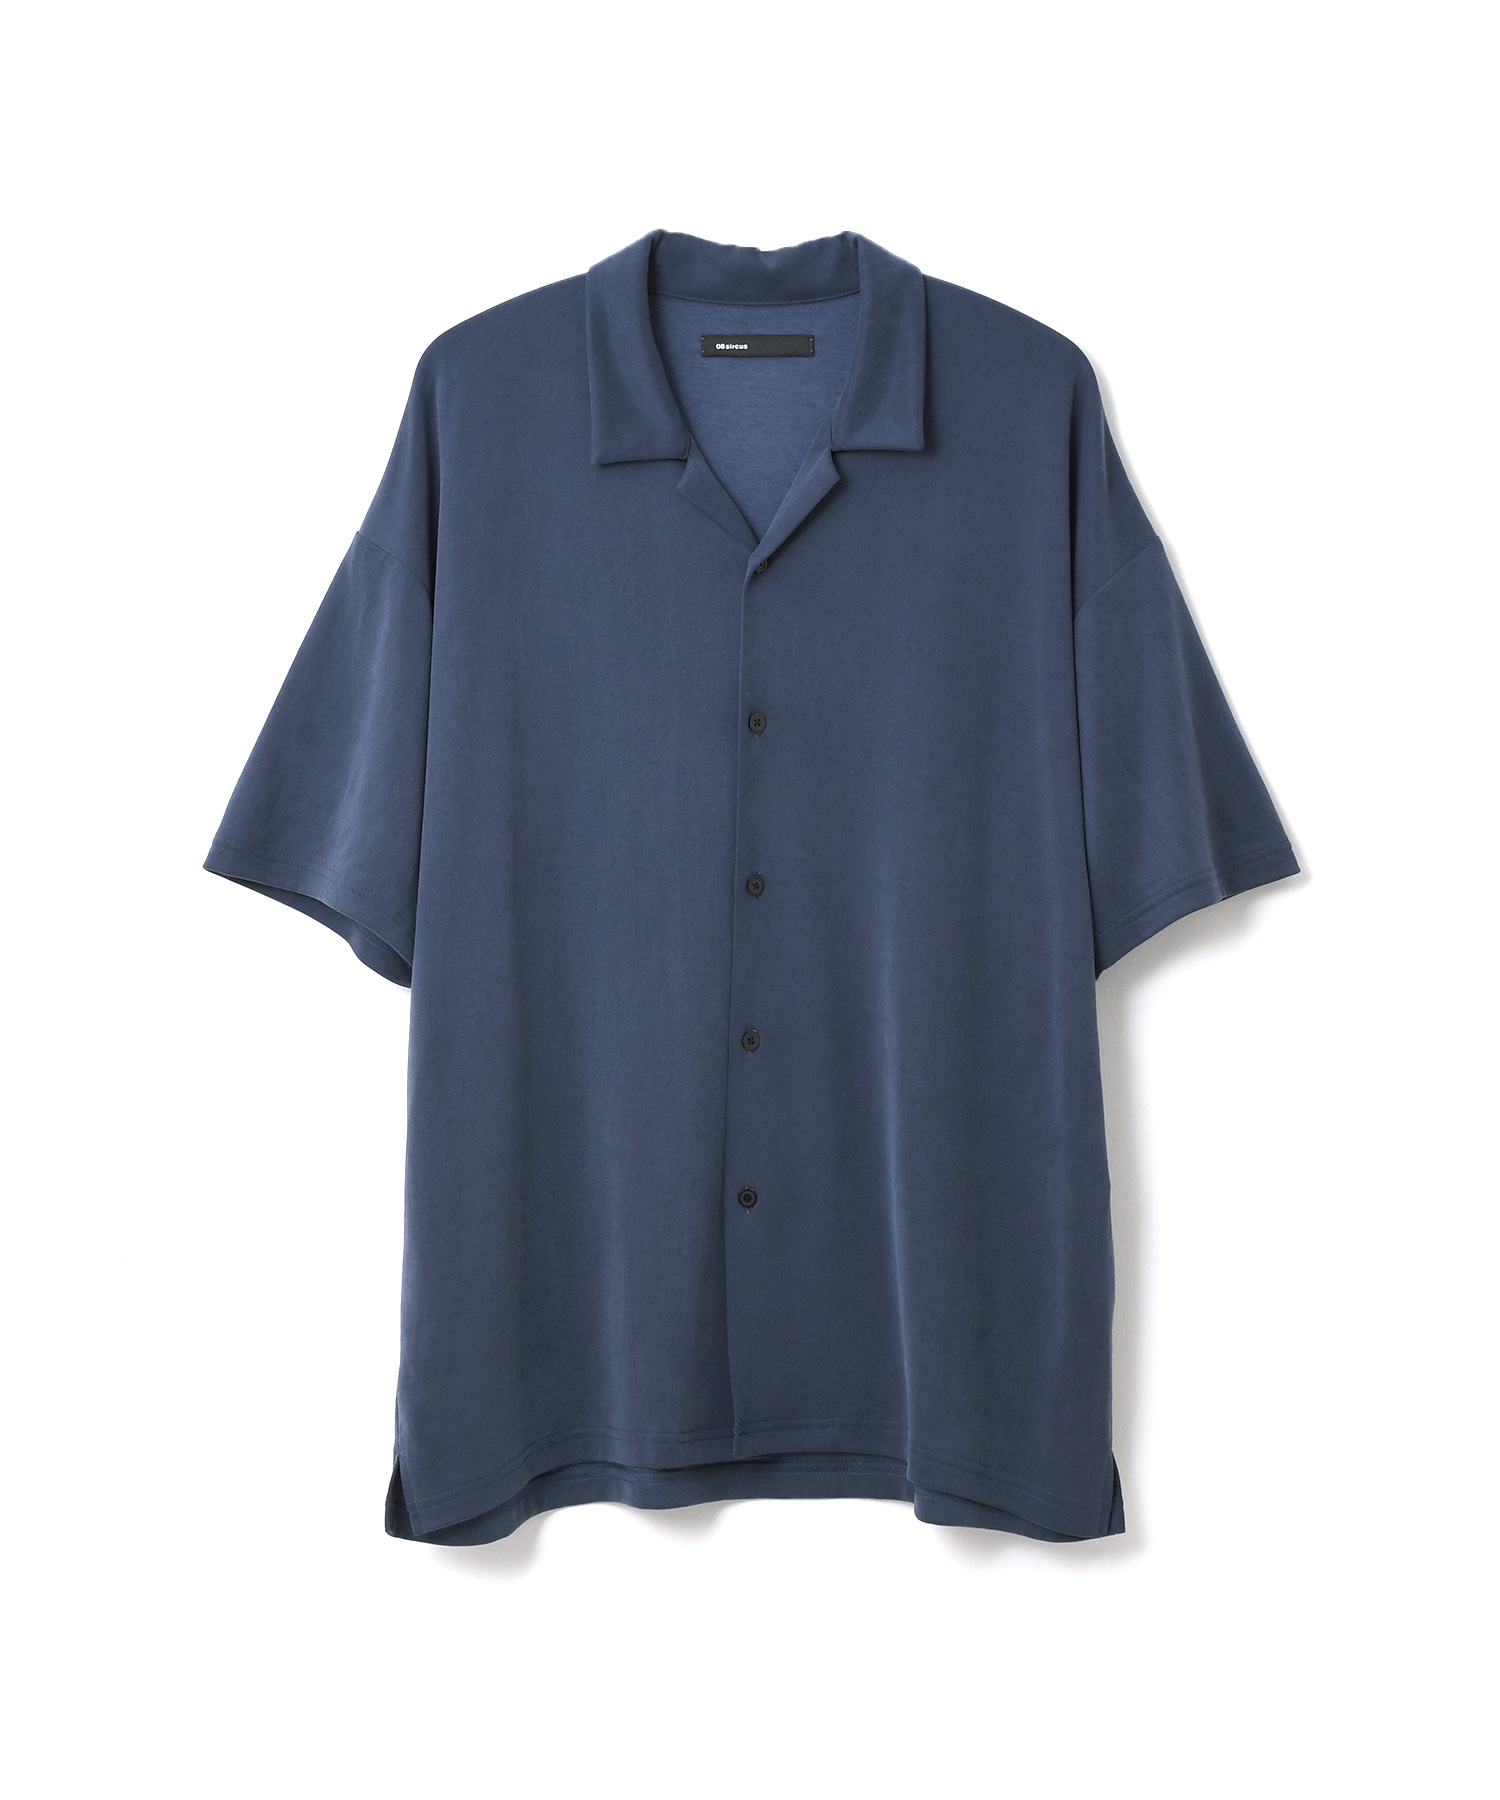 08 SIRCUS / フィブリルキュプラ オープンカラーシャツ《ESTNATION EXCLUSIVE》